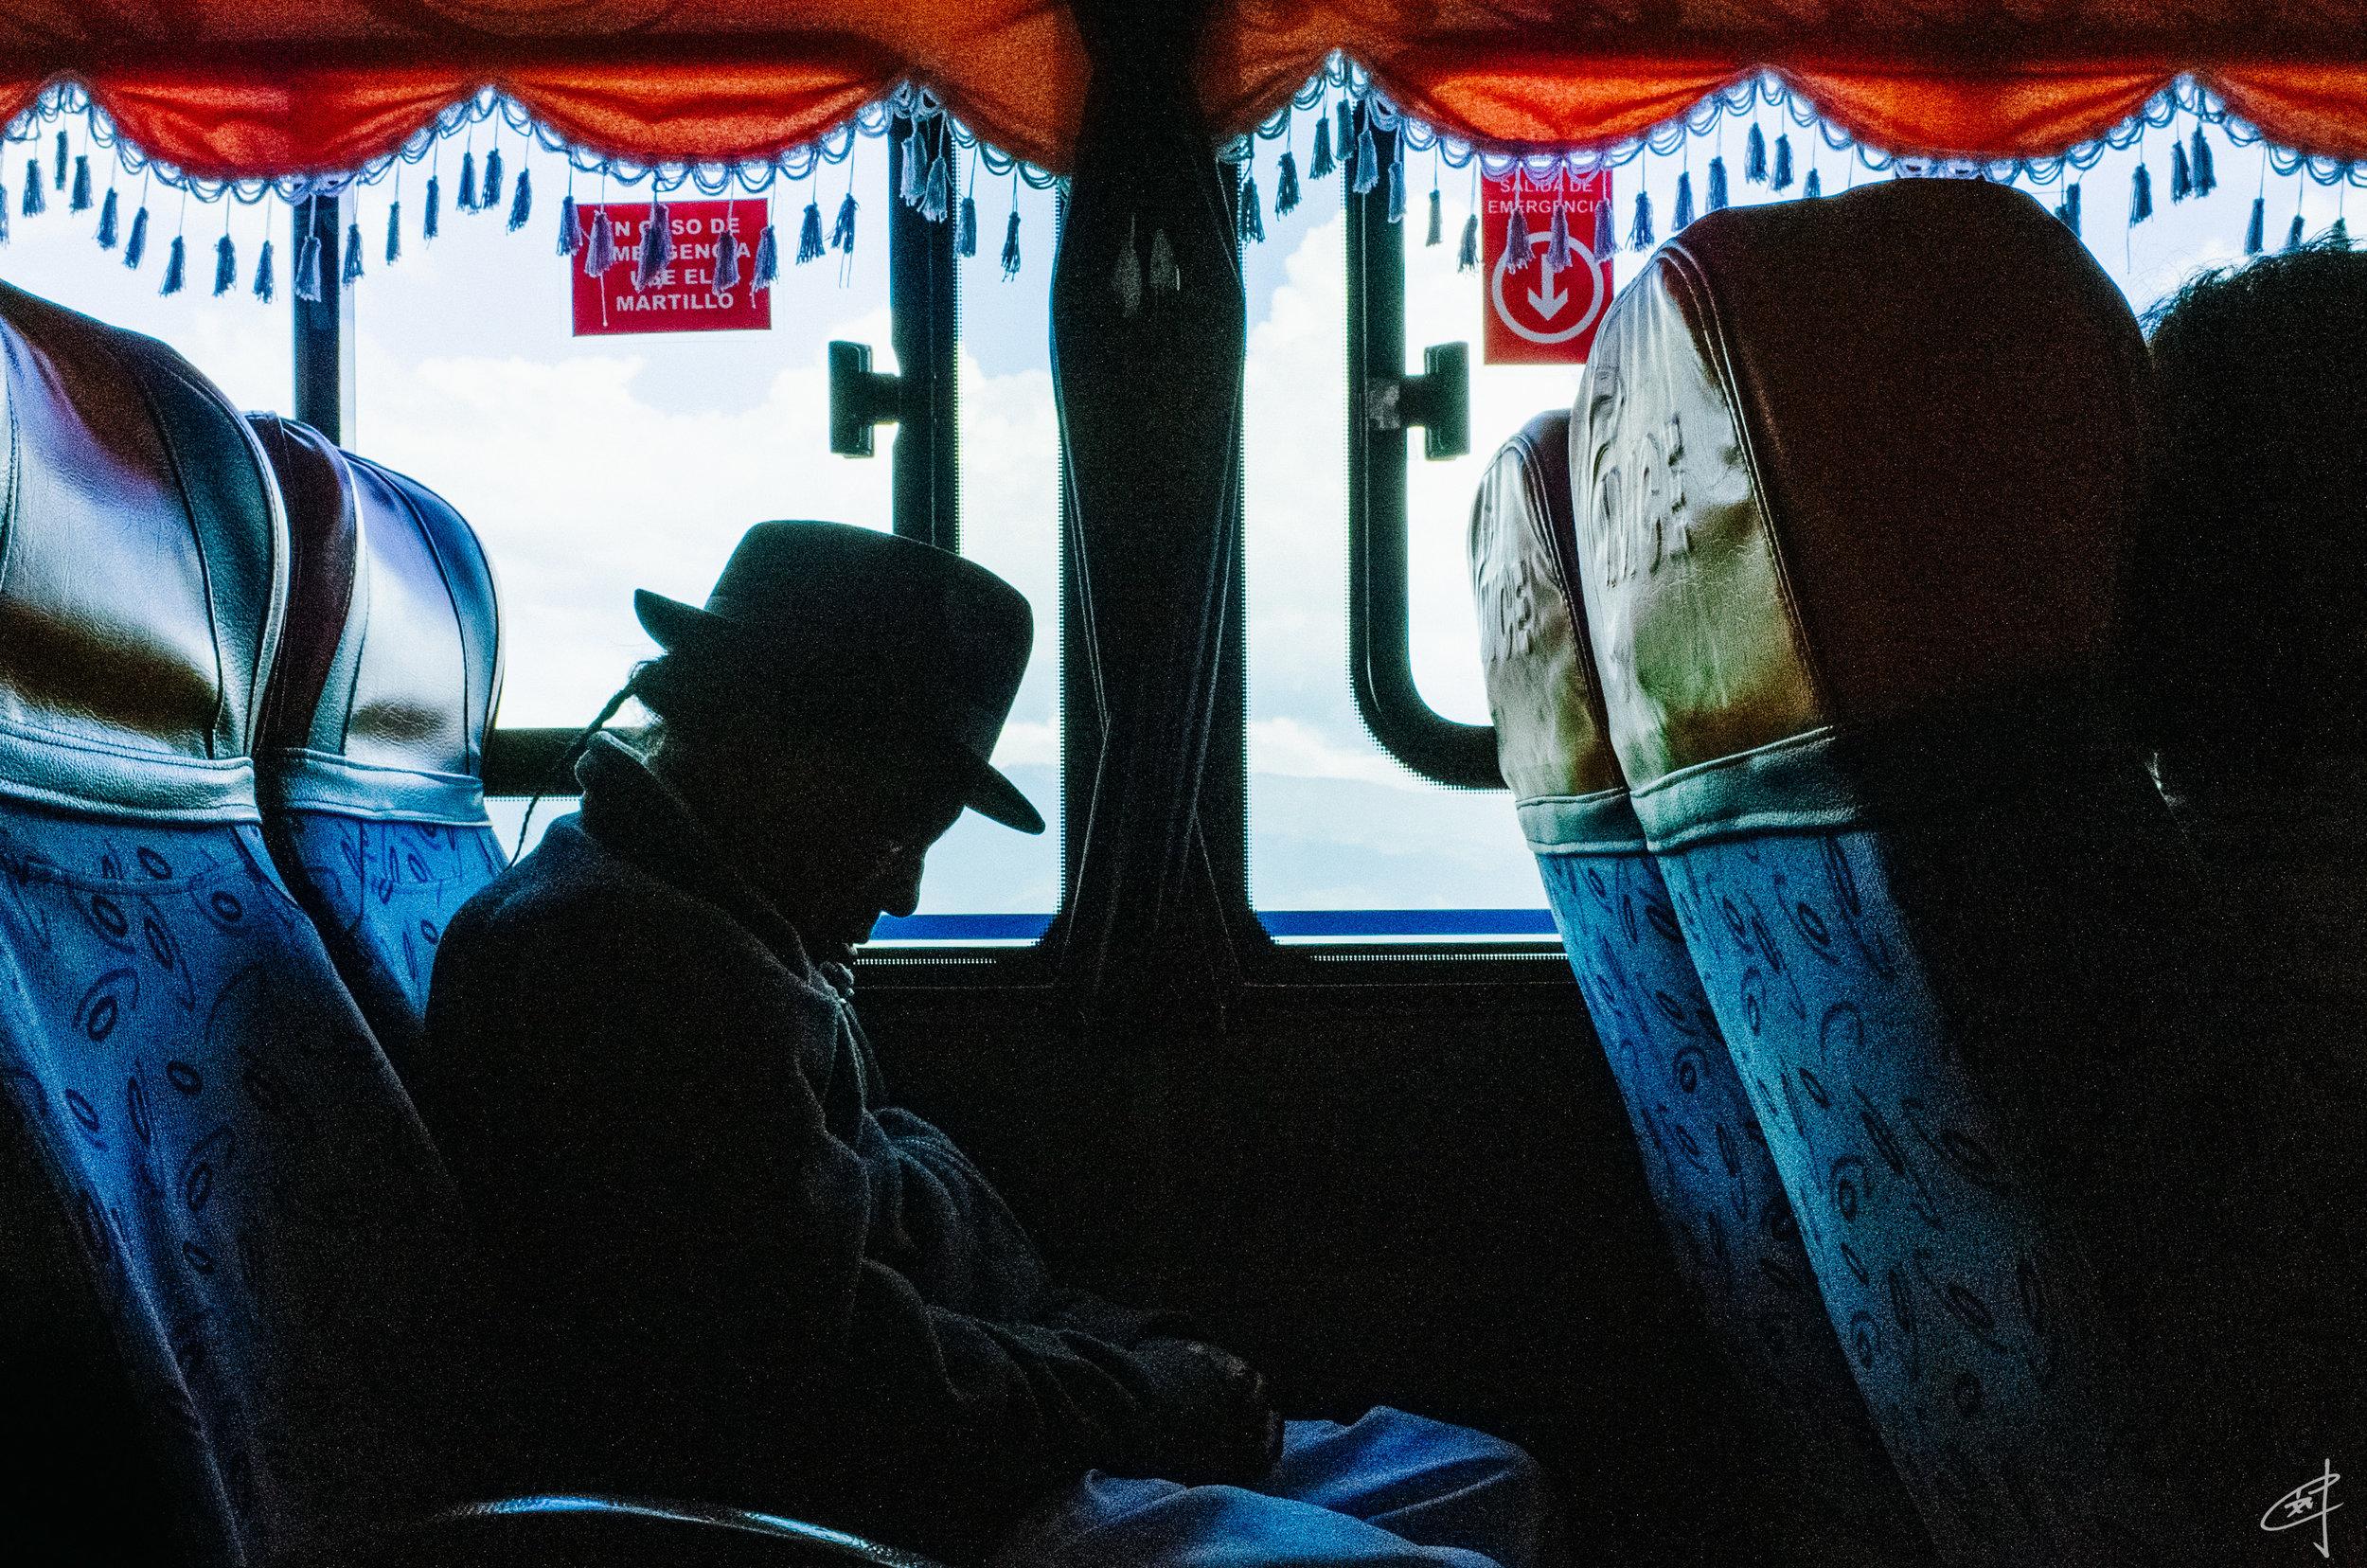 En route to Quito, 2018